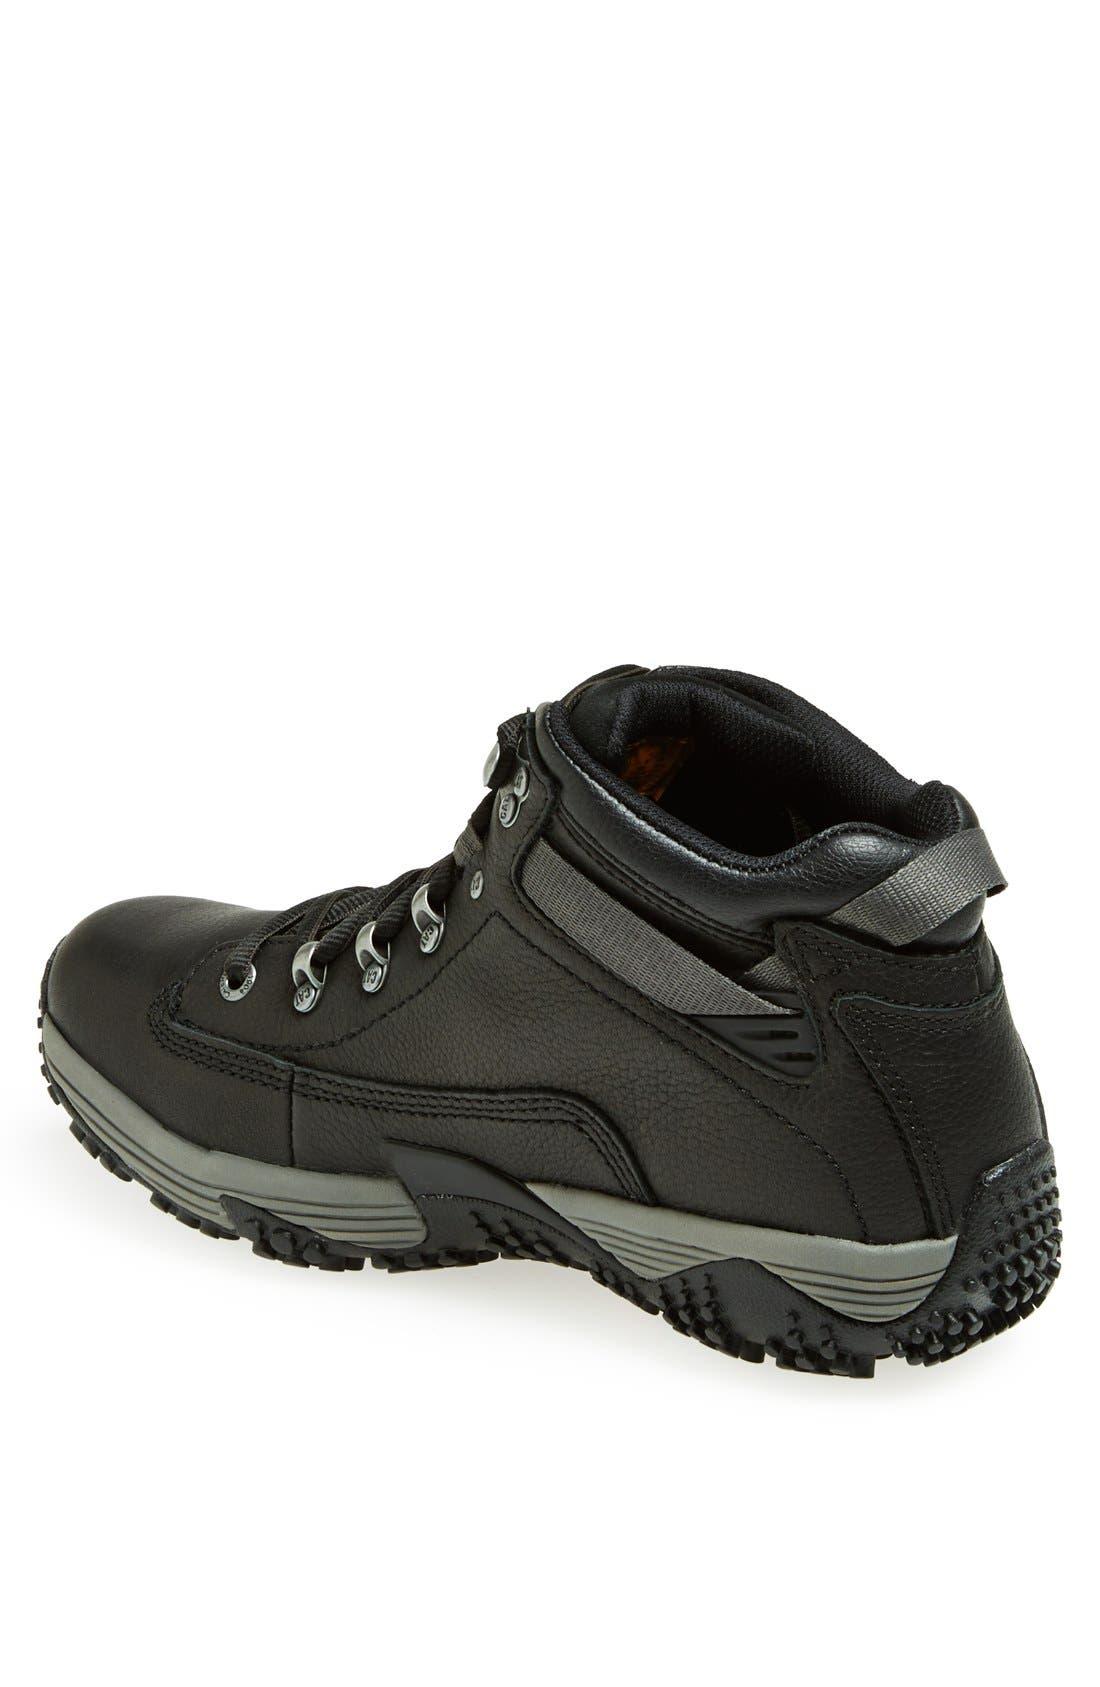 Alternate Image 2  - Caterpillar 'Corax' Hiking Boot (Men)